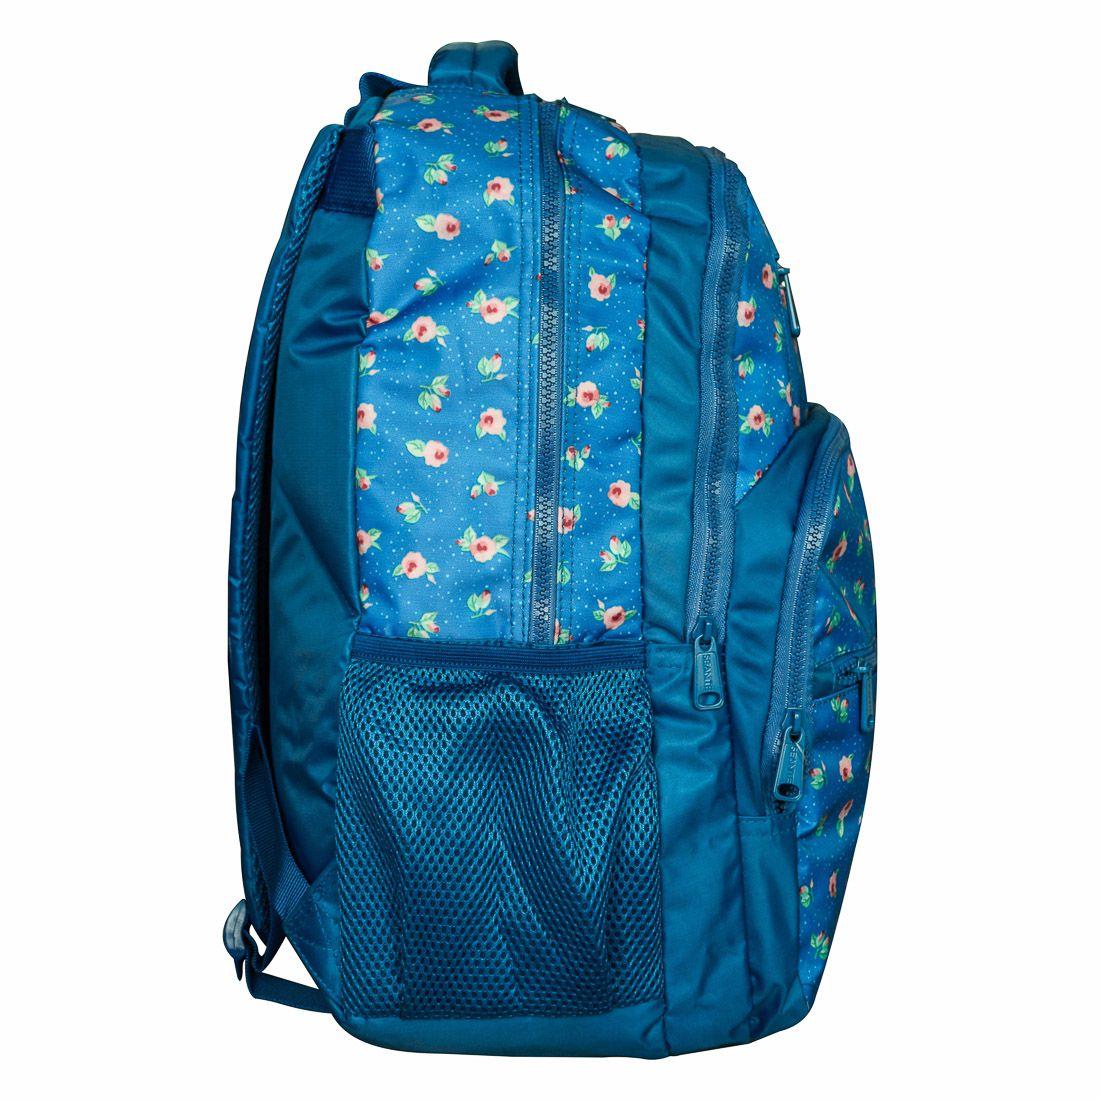 Mochila Escolar Seanite Azul Florida MJ14020